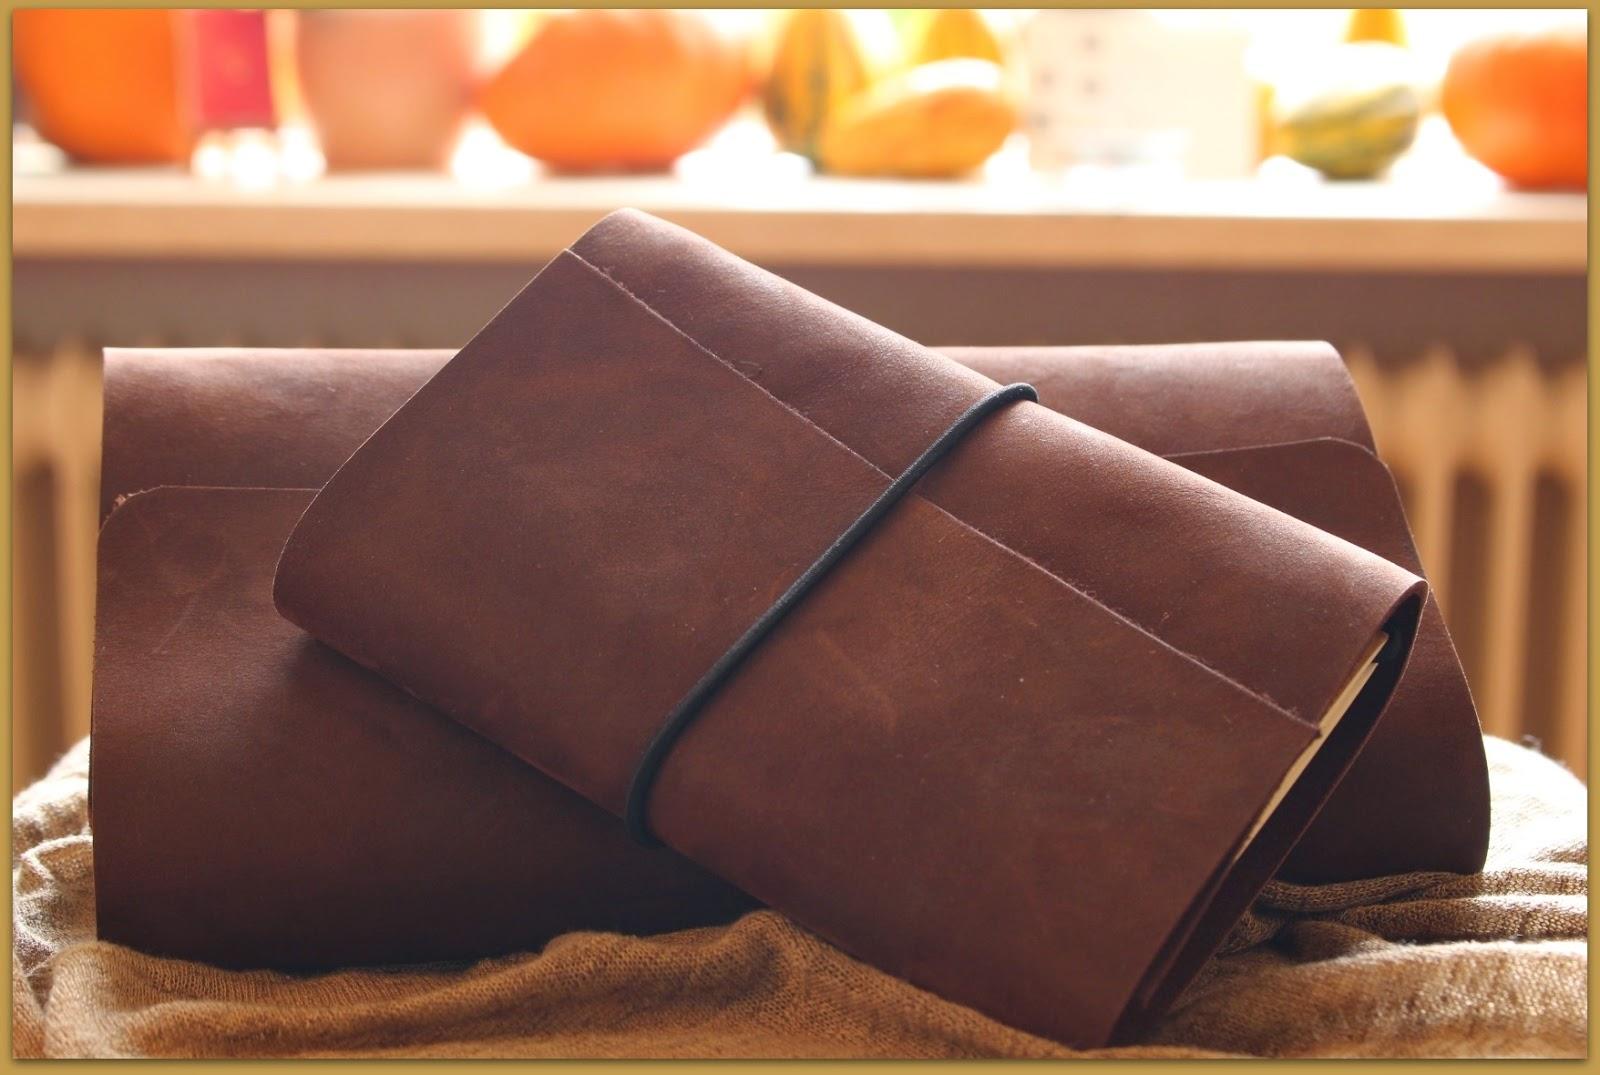 Midori fauxdori Travelers Notebook regular size and A6 in the make